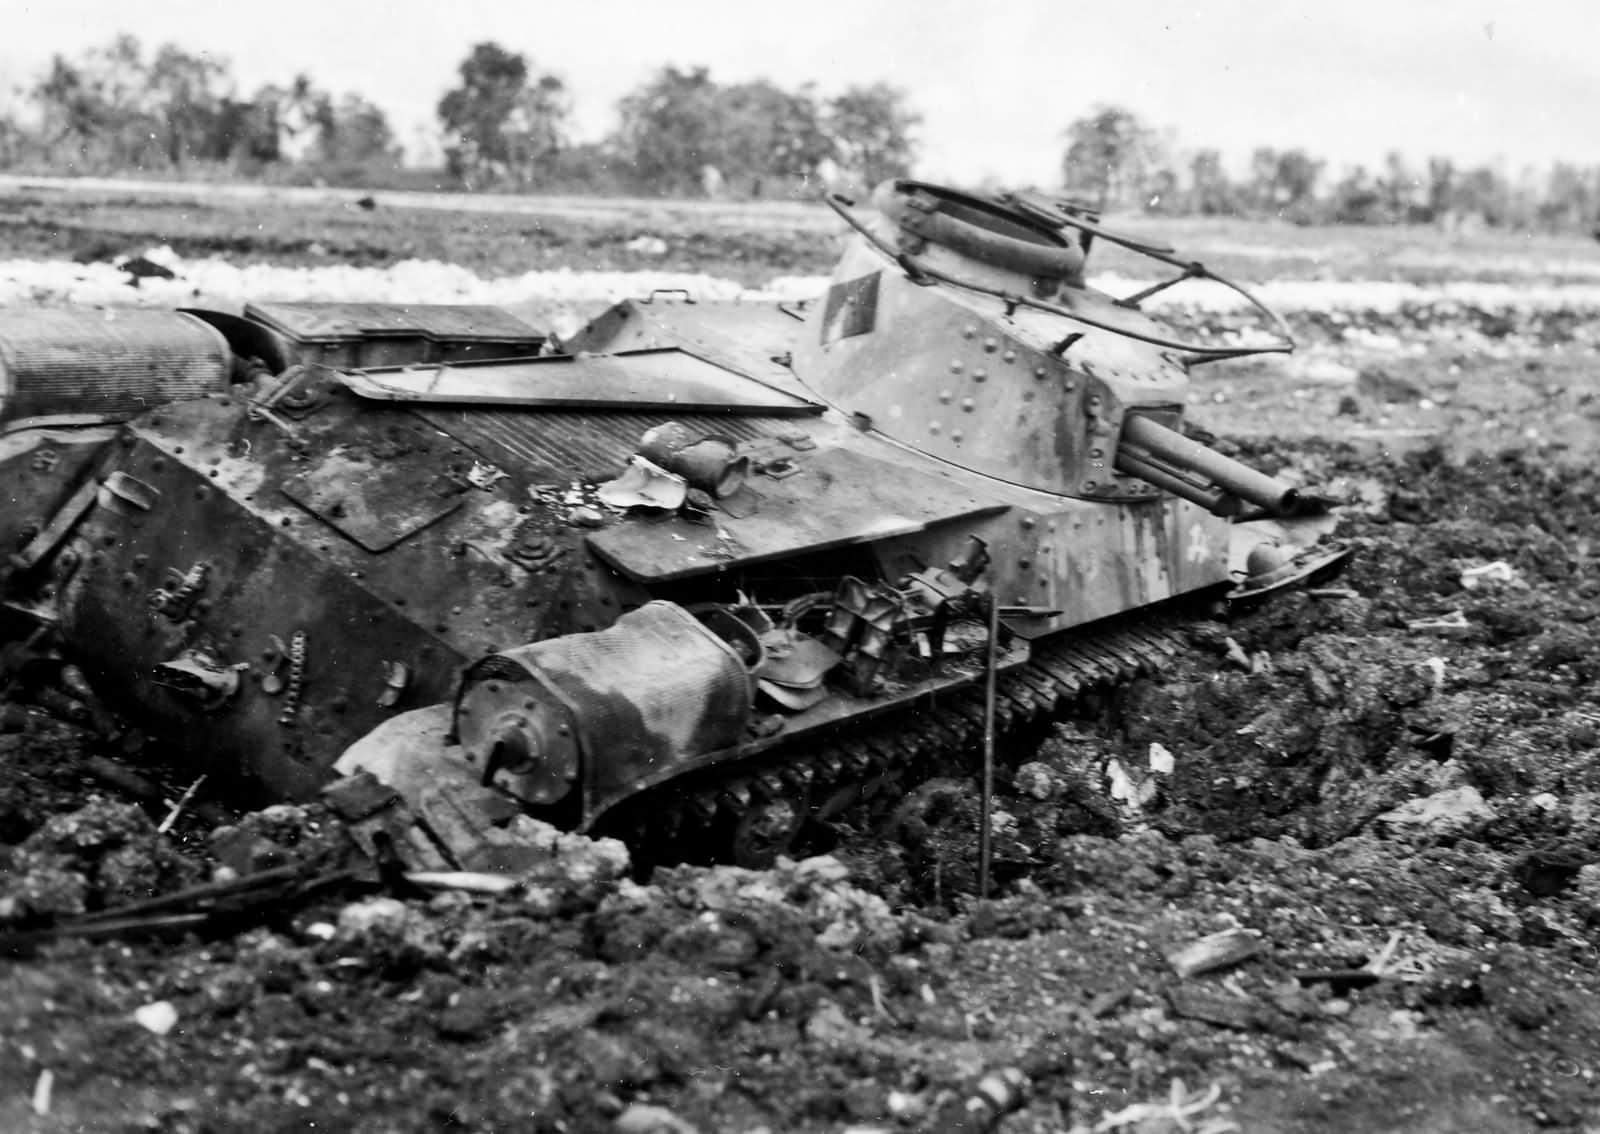 Japanese Type 97 Chi Ha from 9th Tank Regiment Saipan 1944